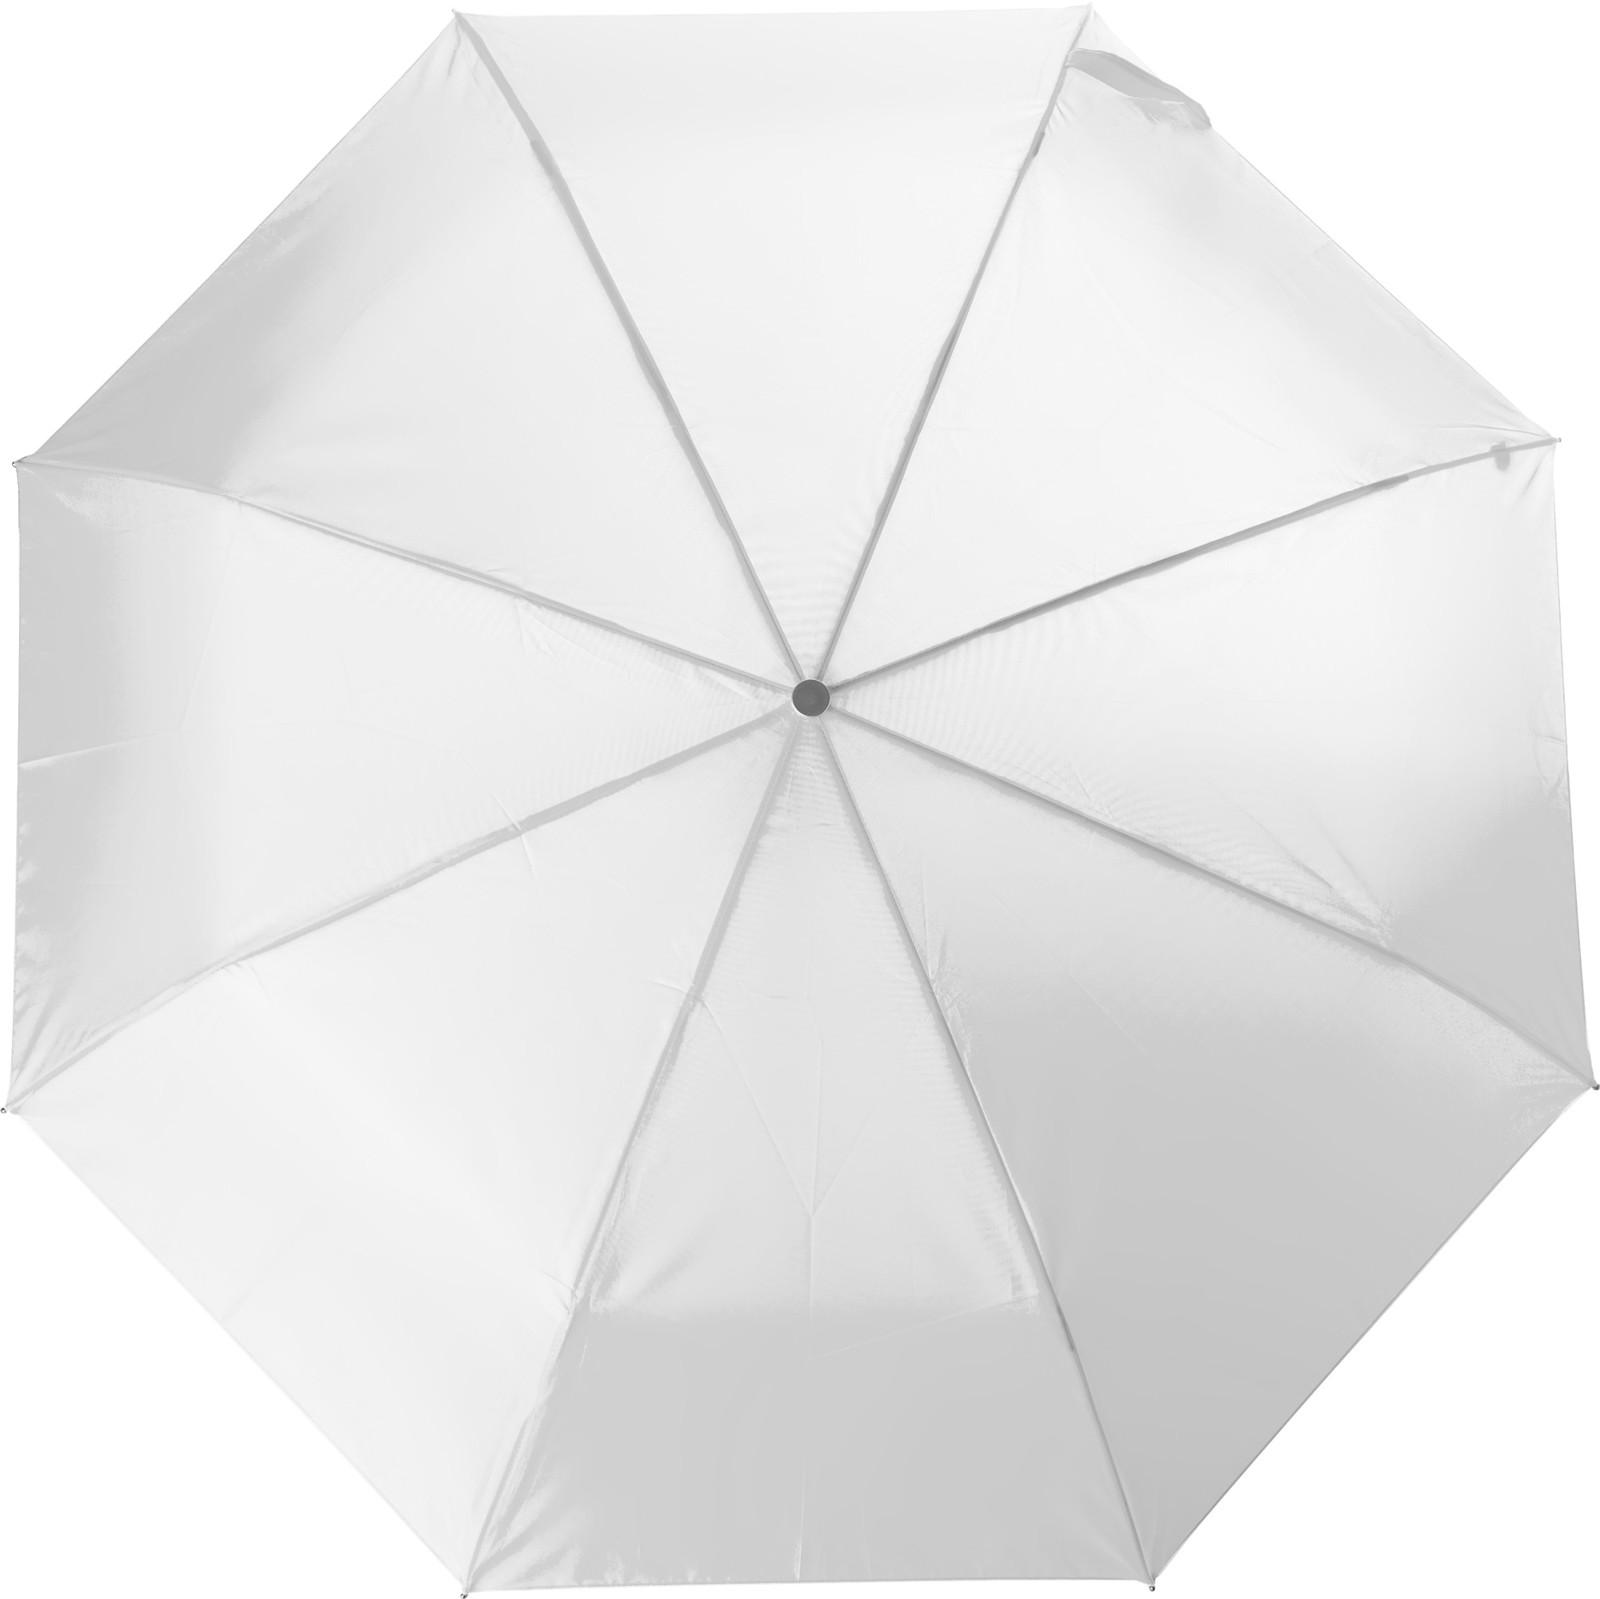 Polyester (210T) umbrella - White